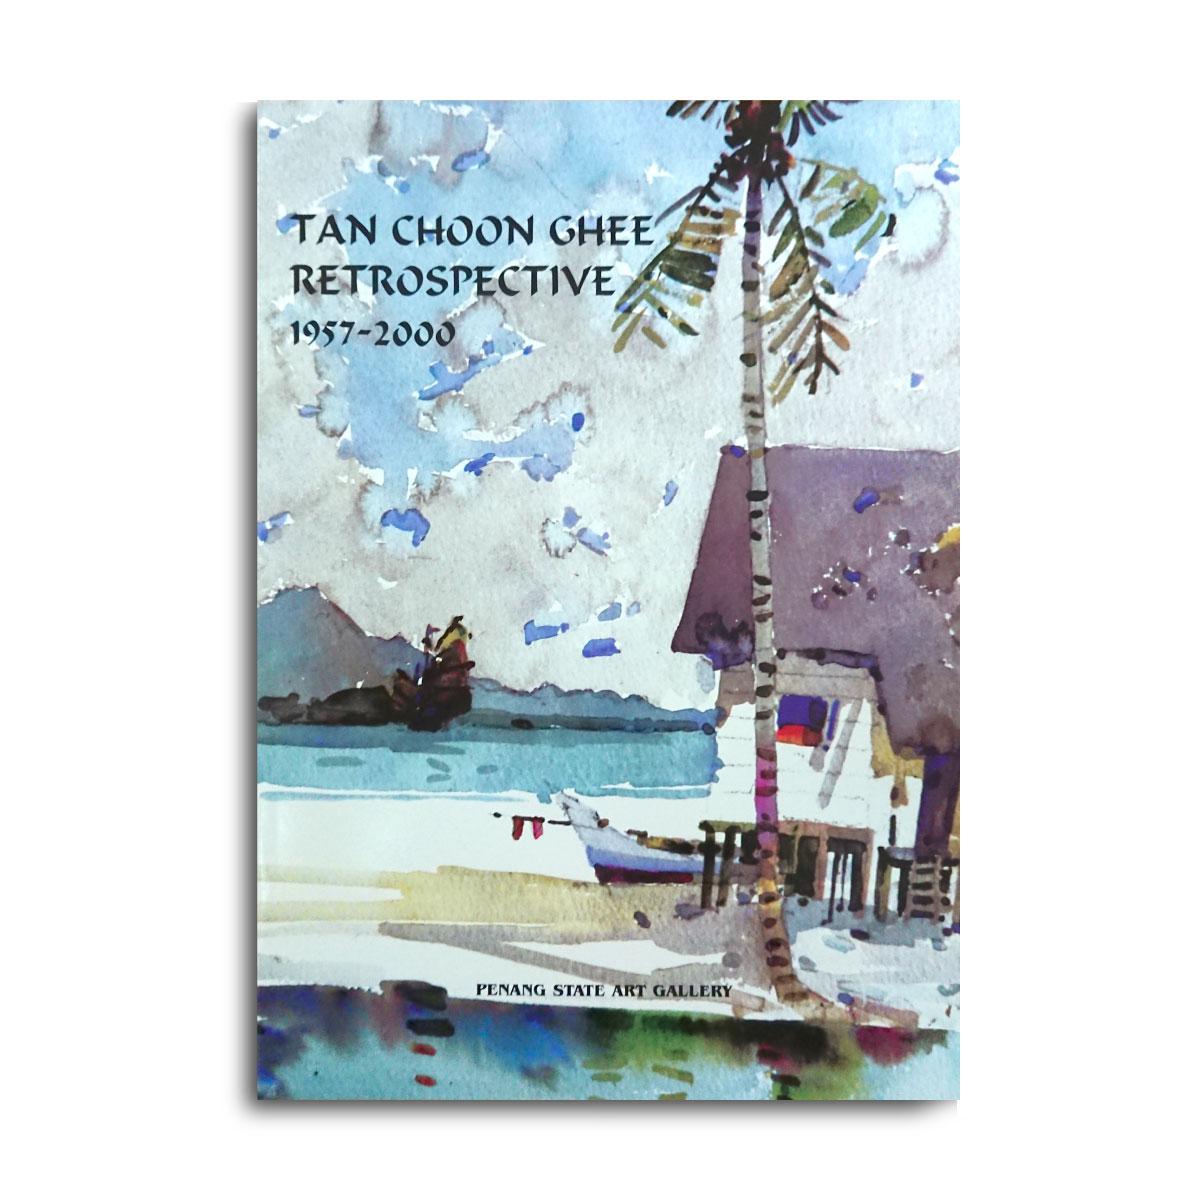 Tan Choon Ghee Retrospective 1957-2000